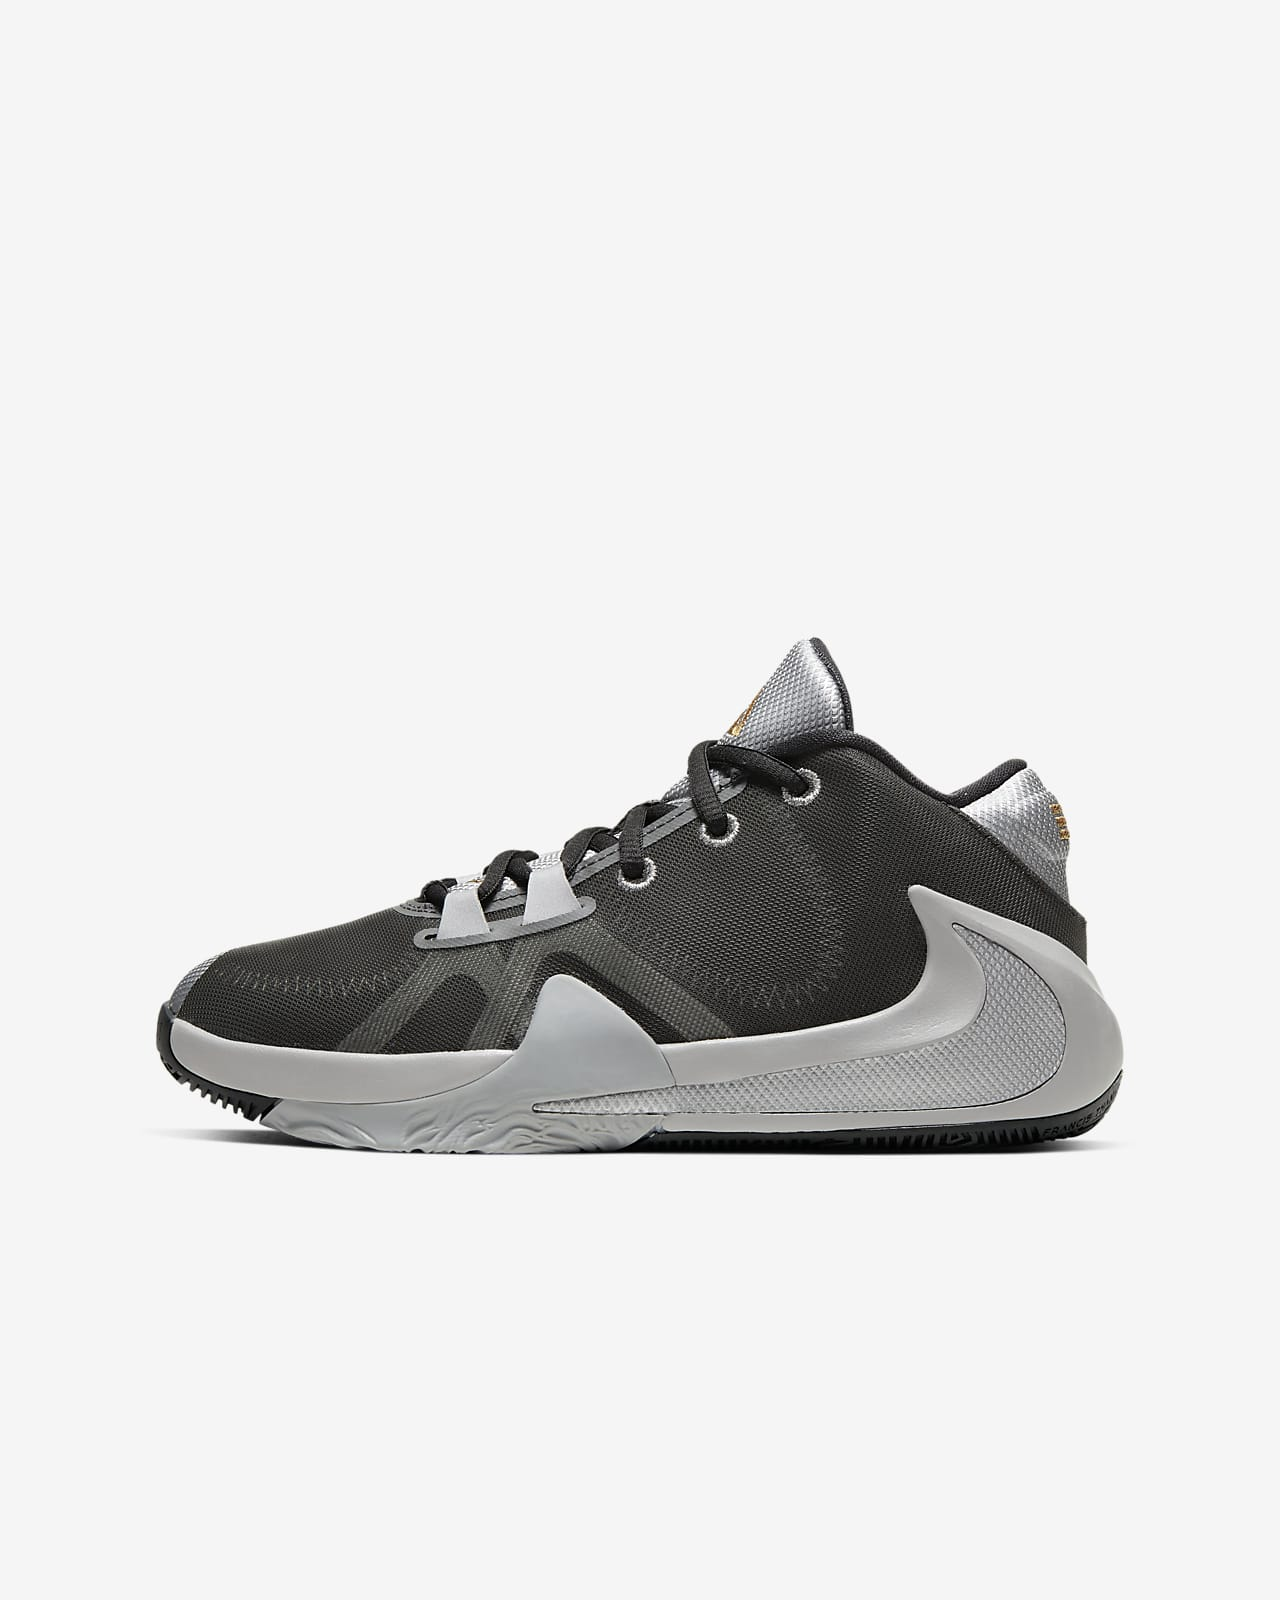 Freak 1 Older Kids' Shoe. Nike SA